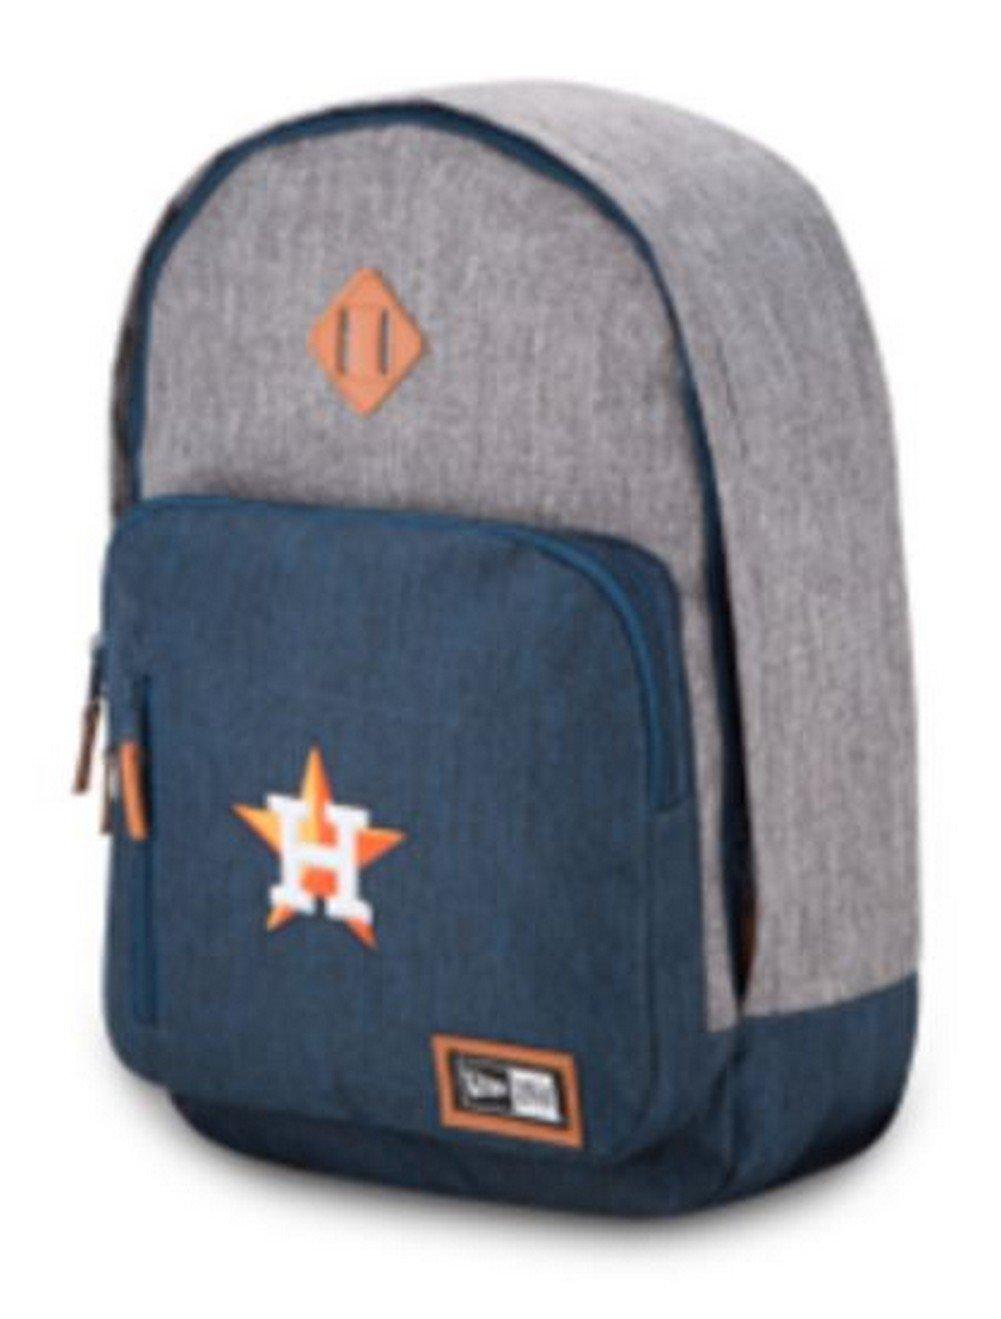 7cf8b9cd1fae Amazon.com : New Era Houston Astros Cram Action Backpack MLB ...